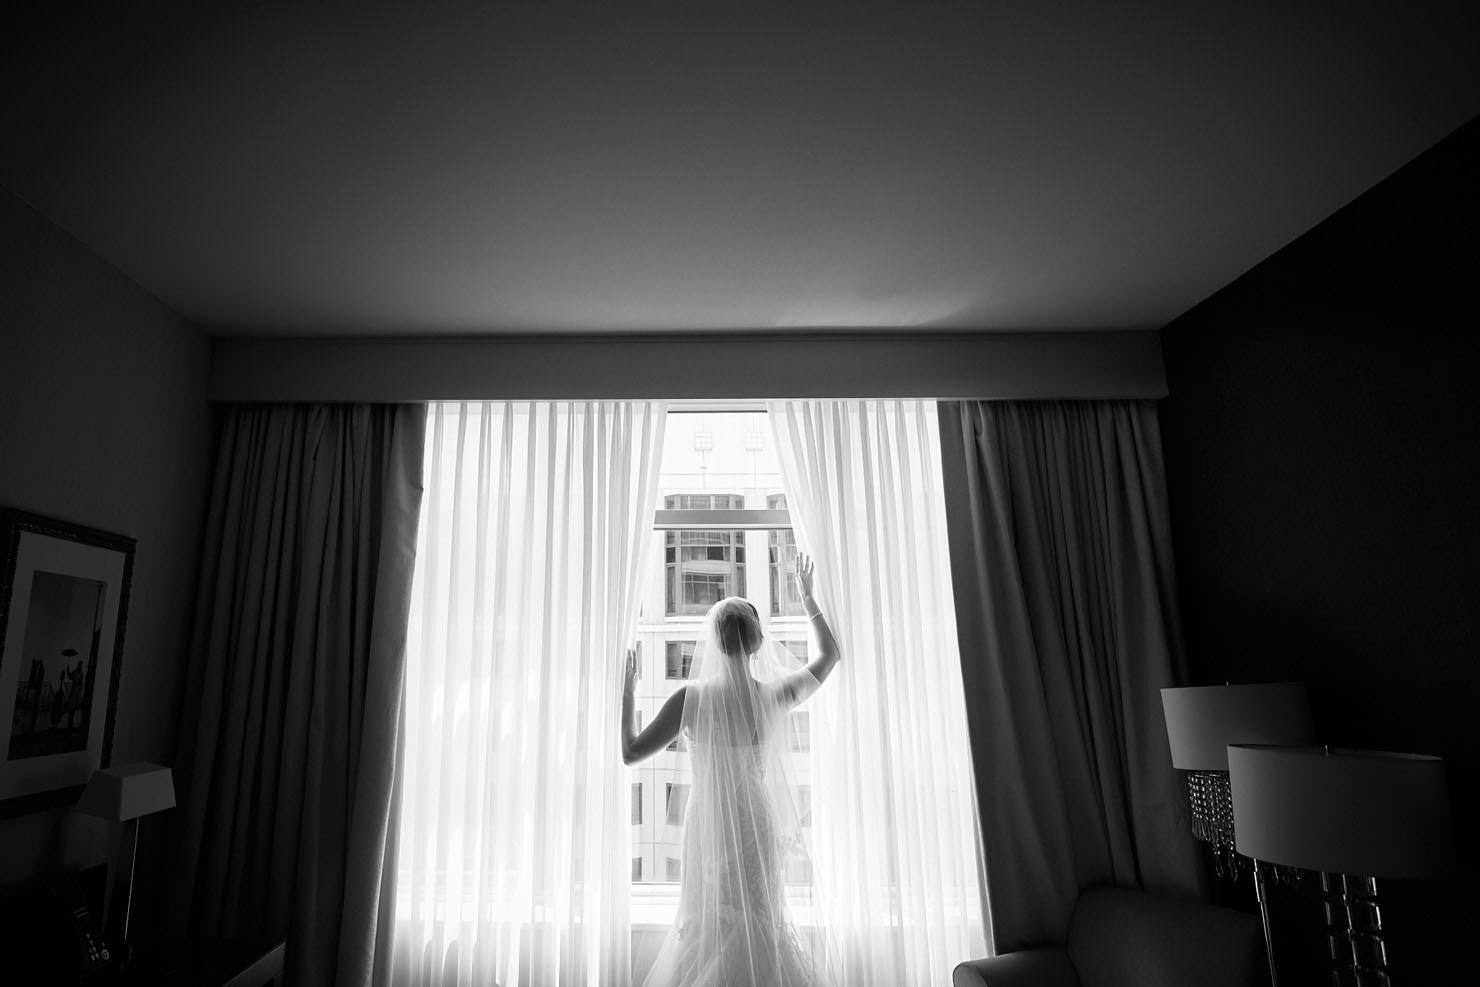 10_Venue-One-Wedding_Chicago_the-wit_0O3A2530-copy Venue One Wedding - Tracy & John